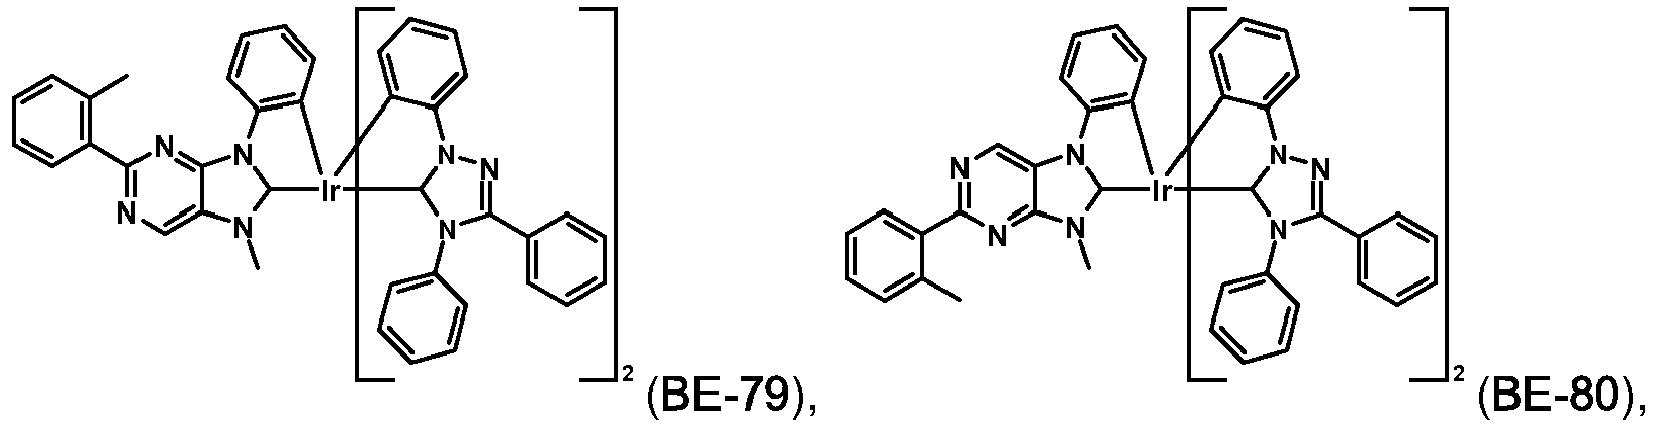 Figure imgb0786